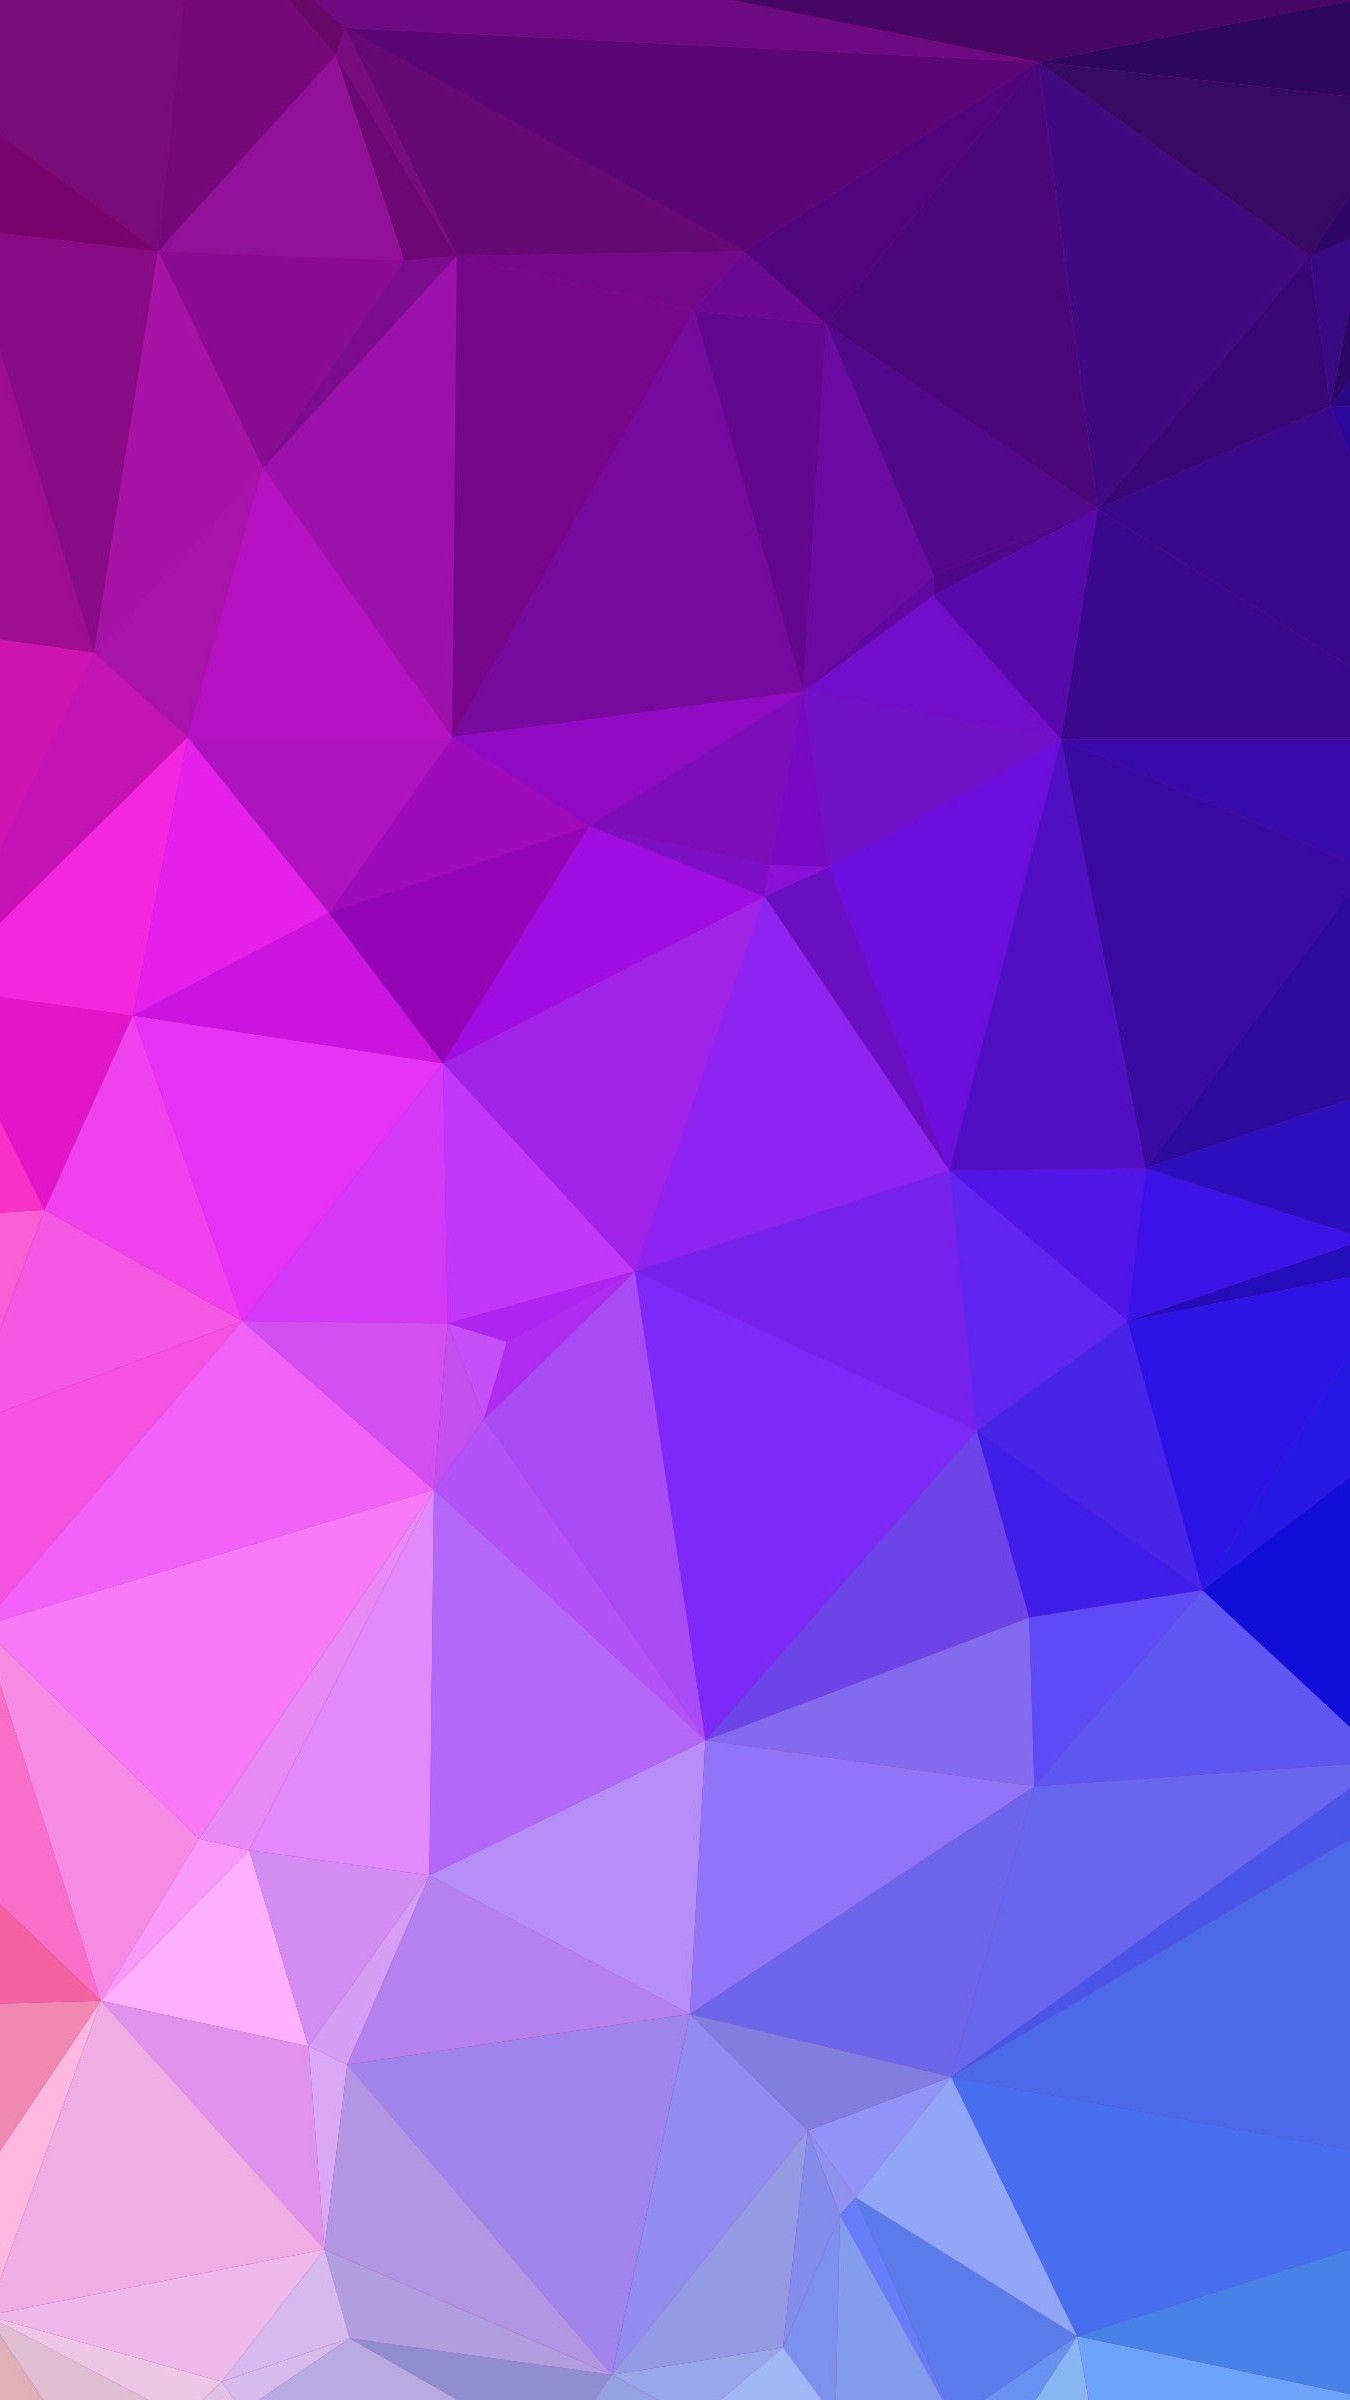 Free download Geometric Wallpaper HD iPhone wallpaper ...